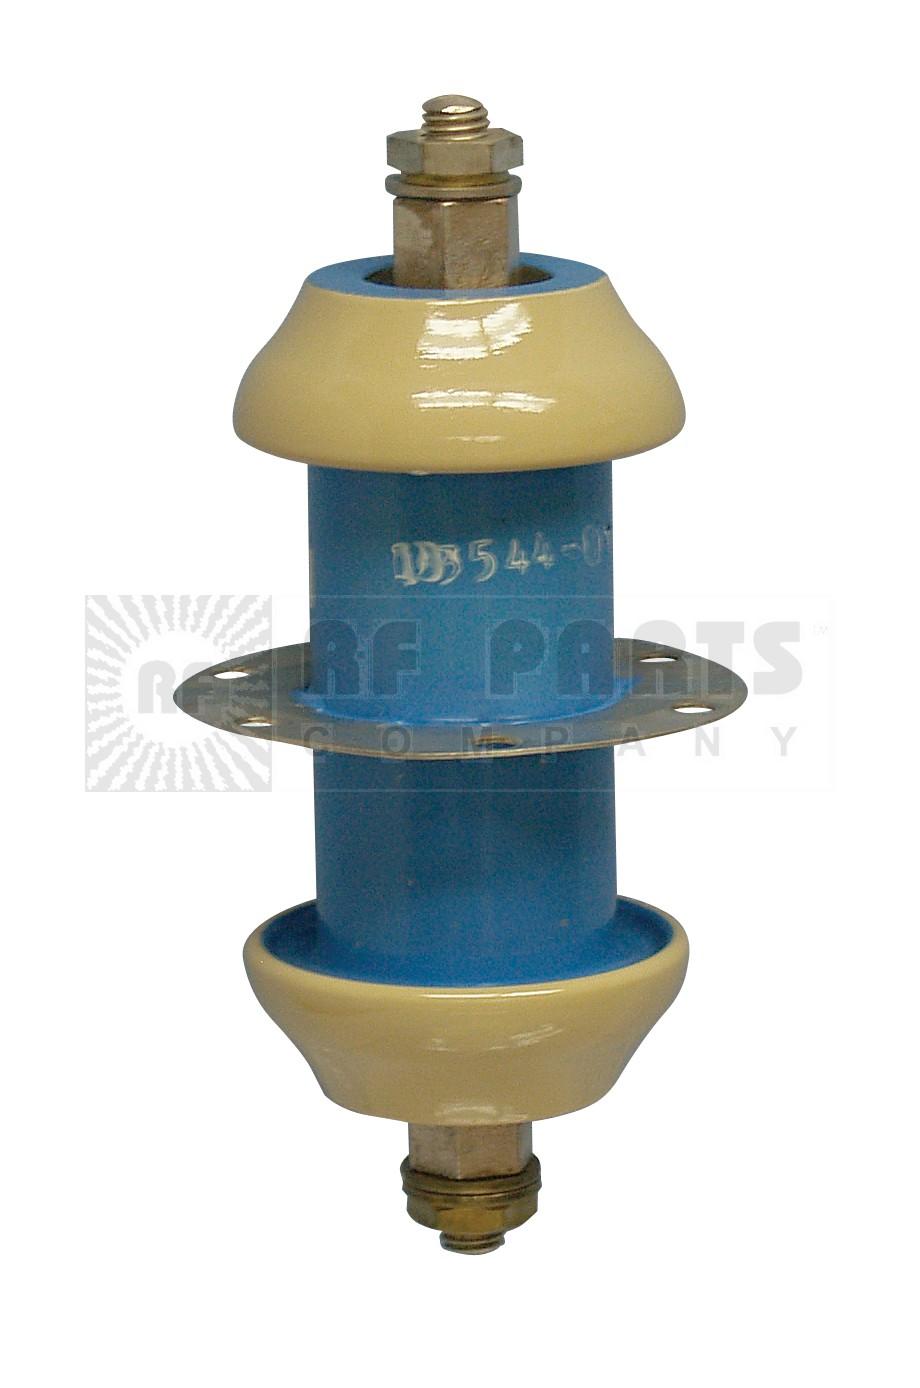 FT1000-14 Feed Thru Capacitor, 1000pf 14kv, Vishay Draloric